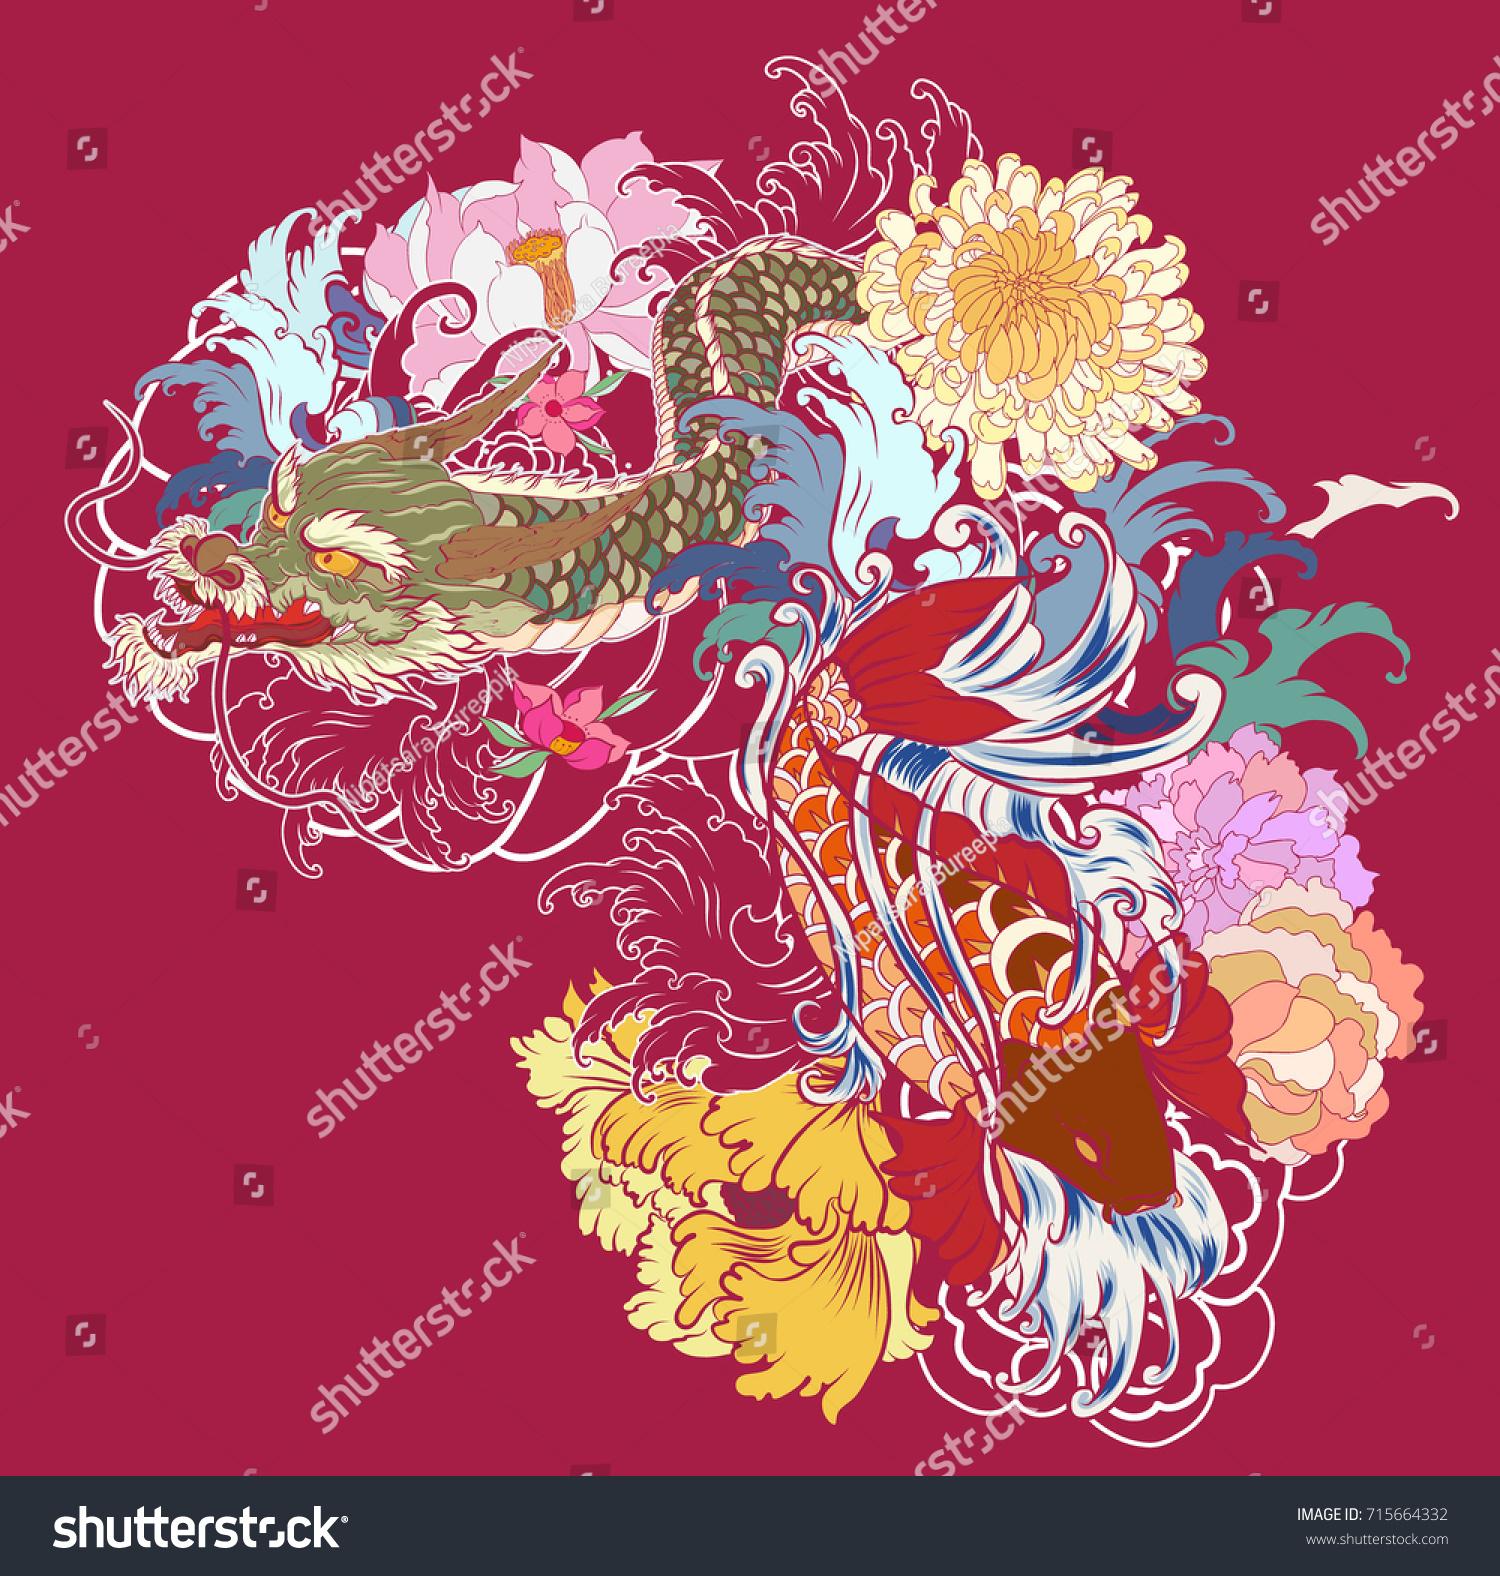 Hand Drawn Dragon Koi Fish Flower Stock Vector 715664332 - Shutterstock